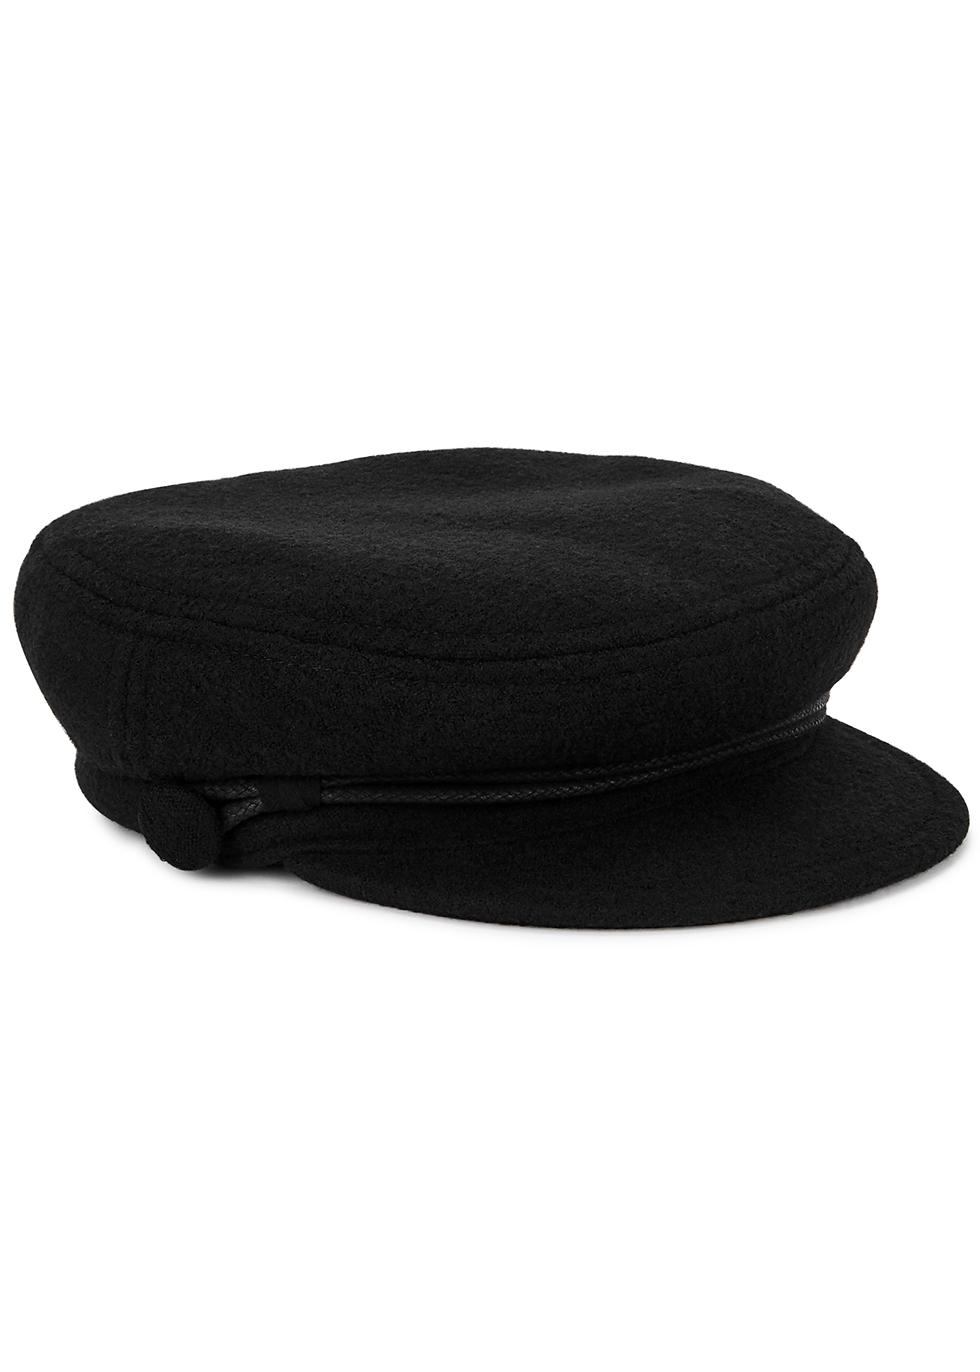 New Abby black bouclé wool cap